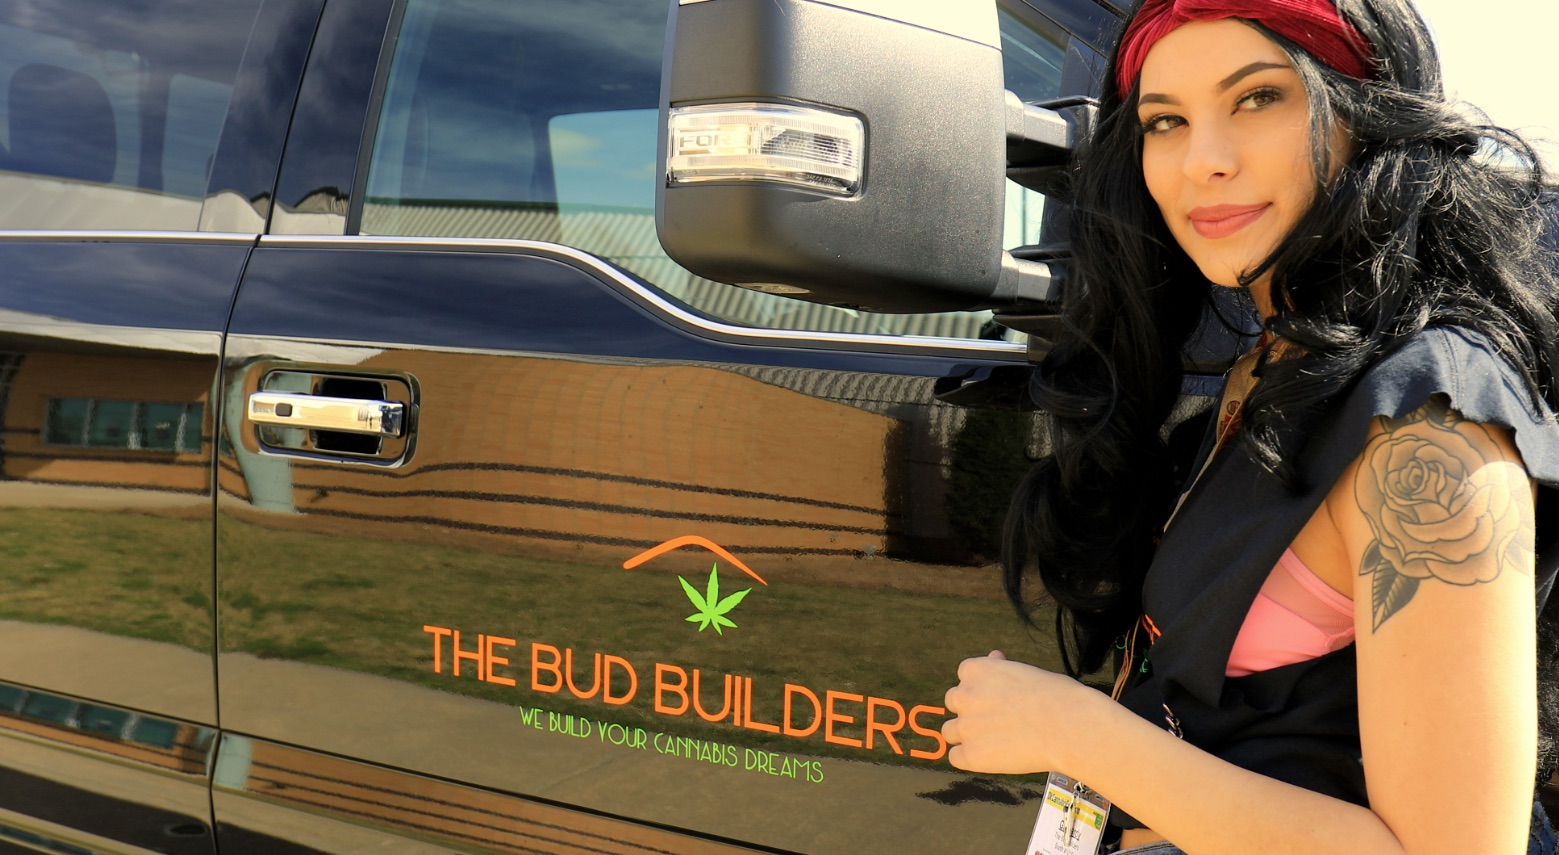 The Bud Builders